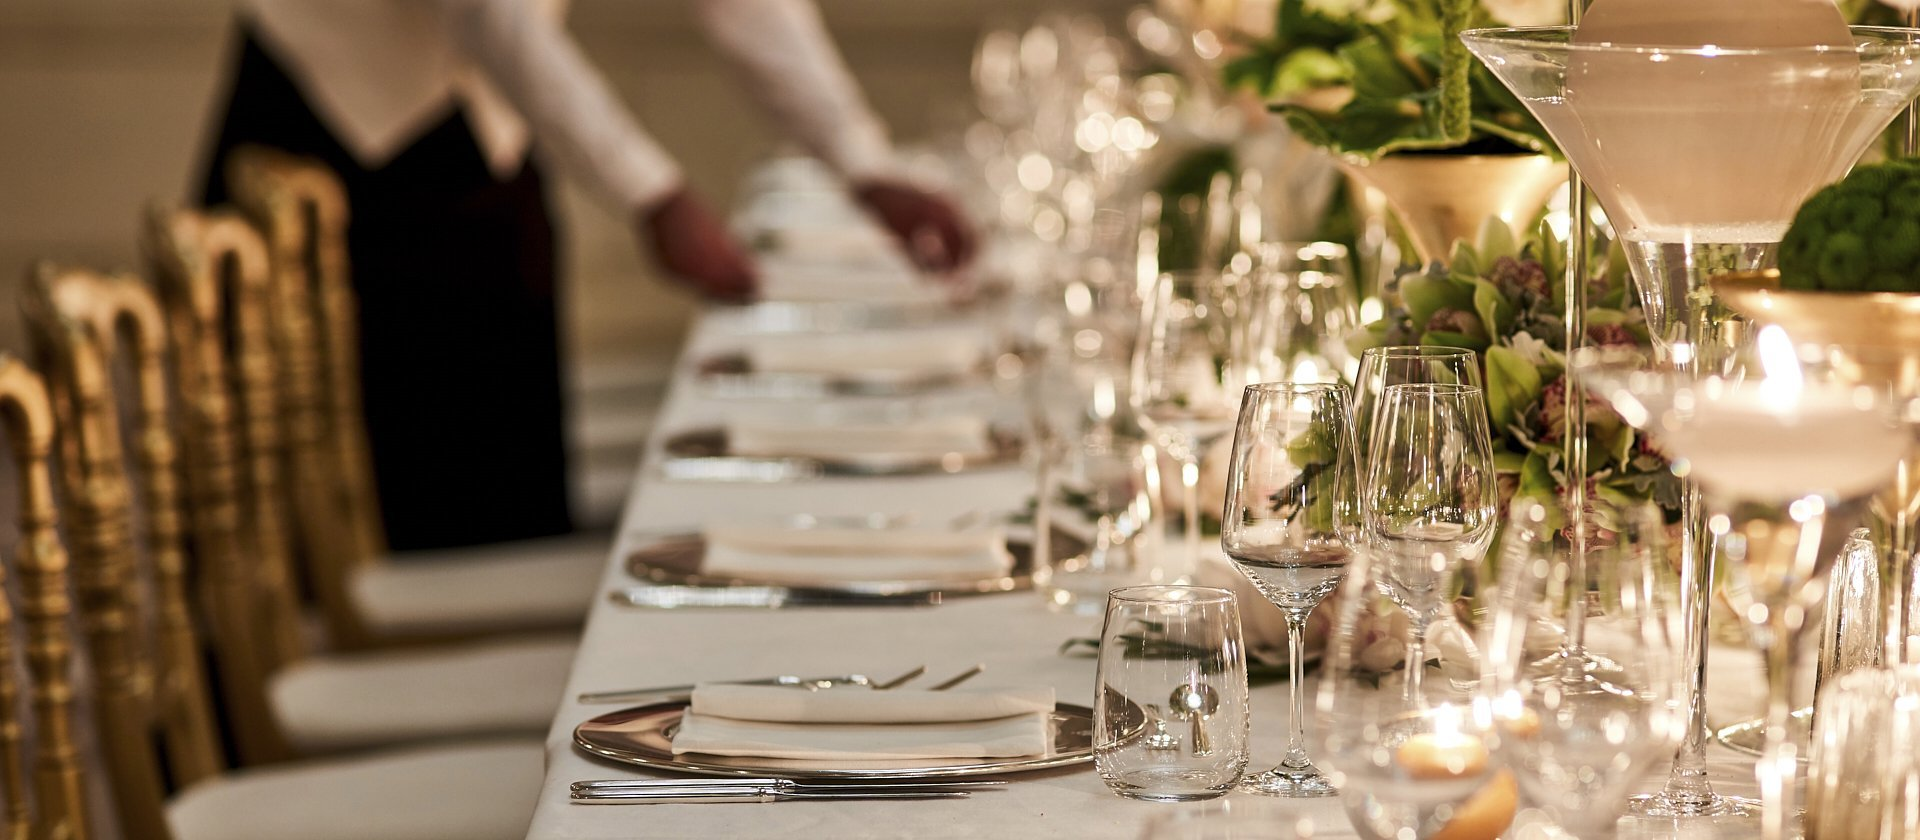 Hotel Principe di Savoia event spaces, Cristalli Gala dinner